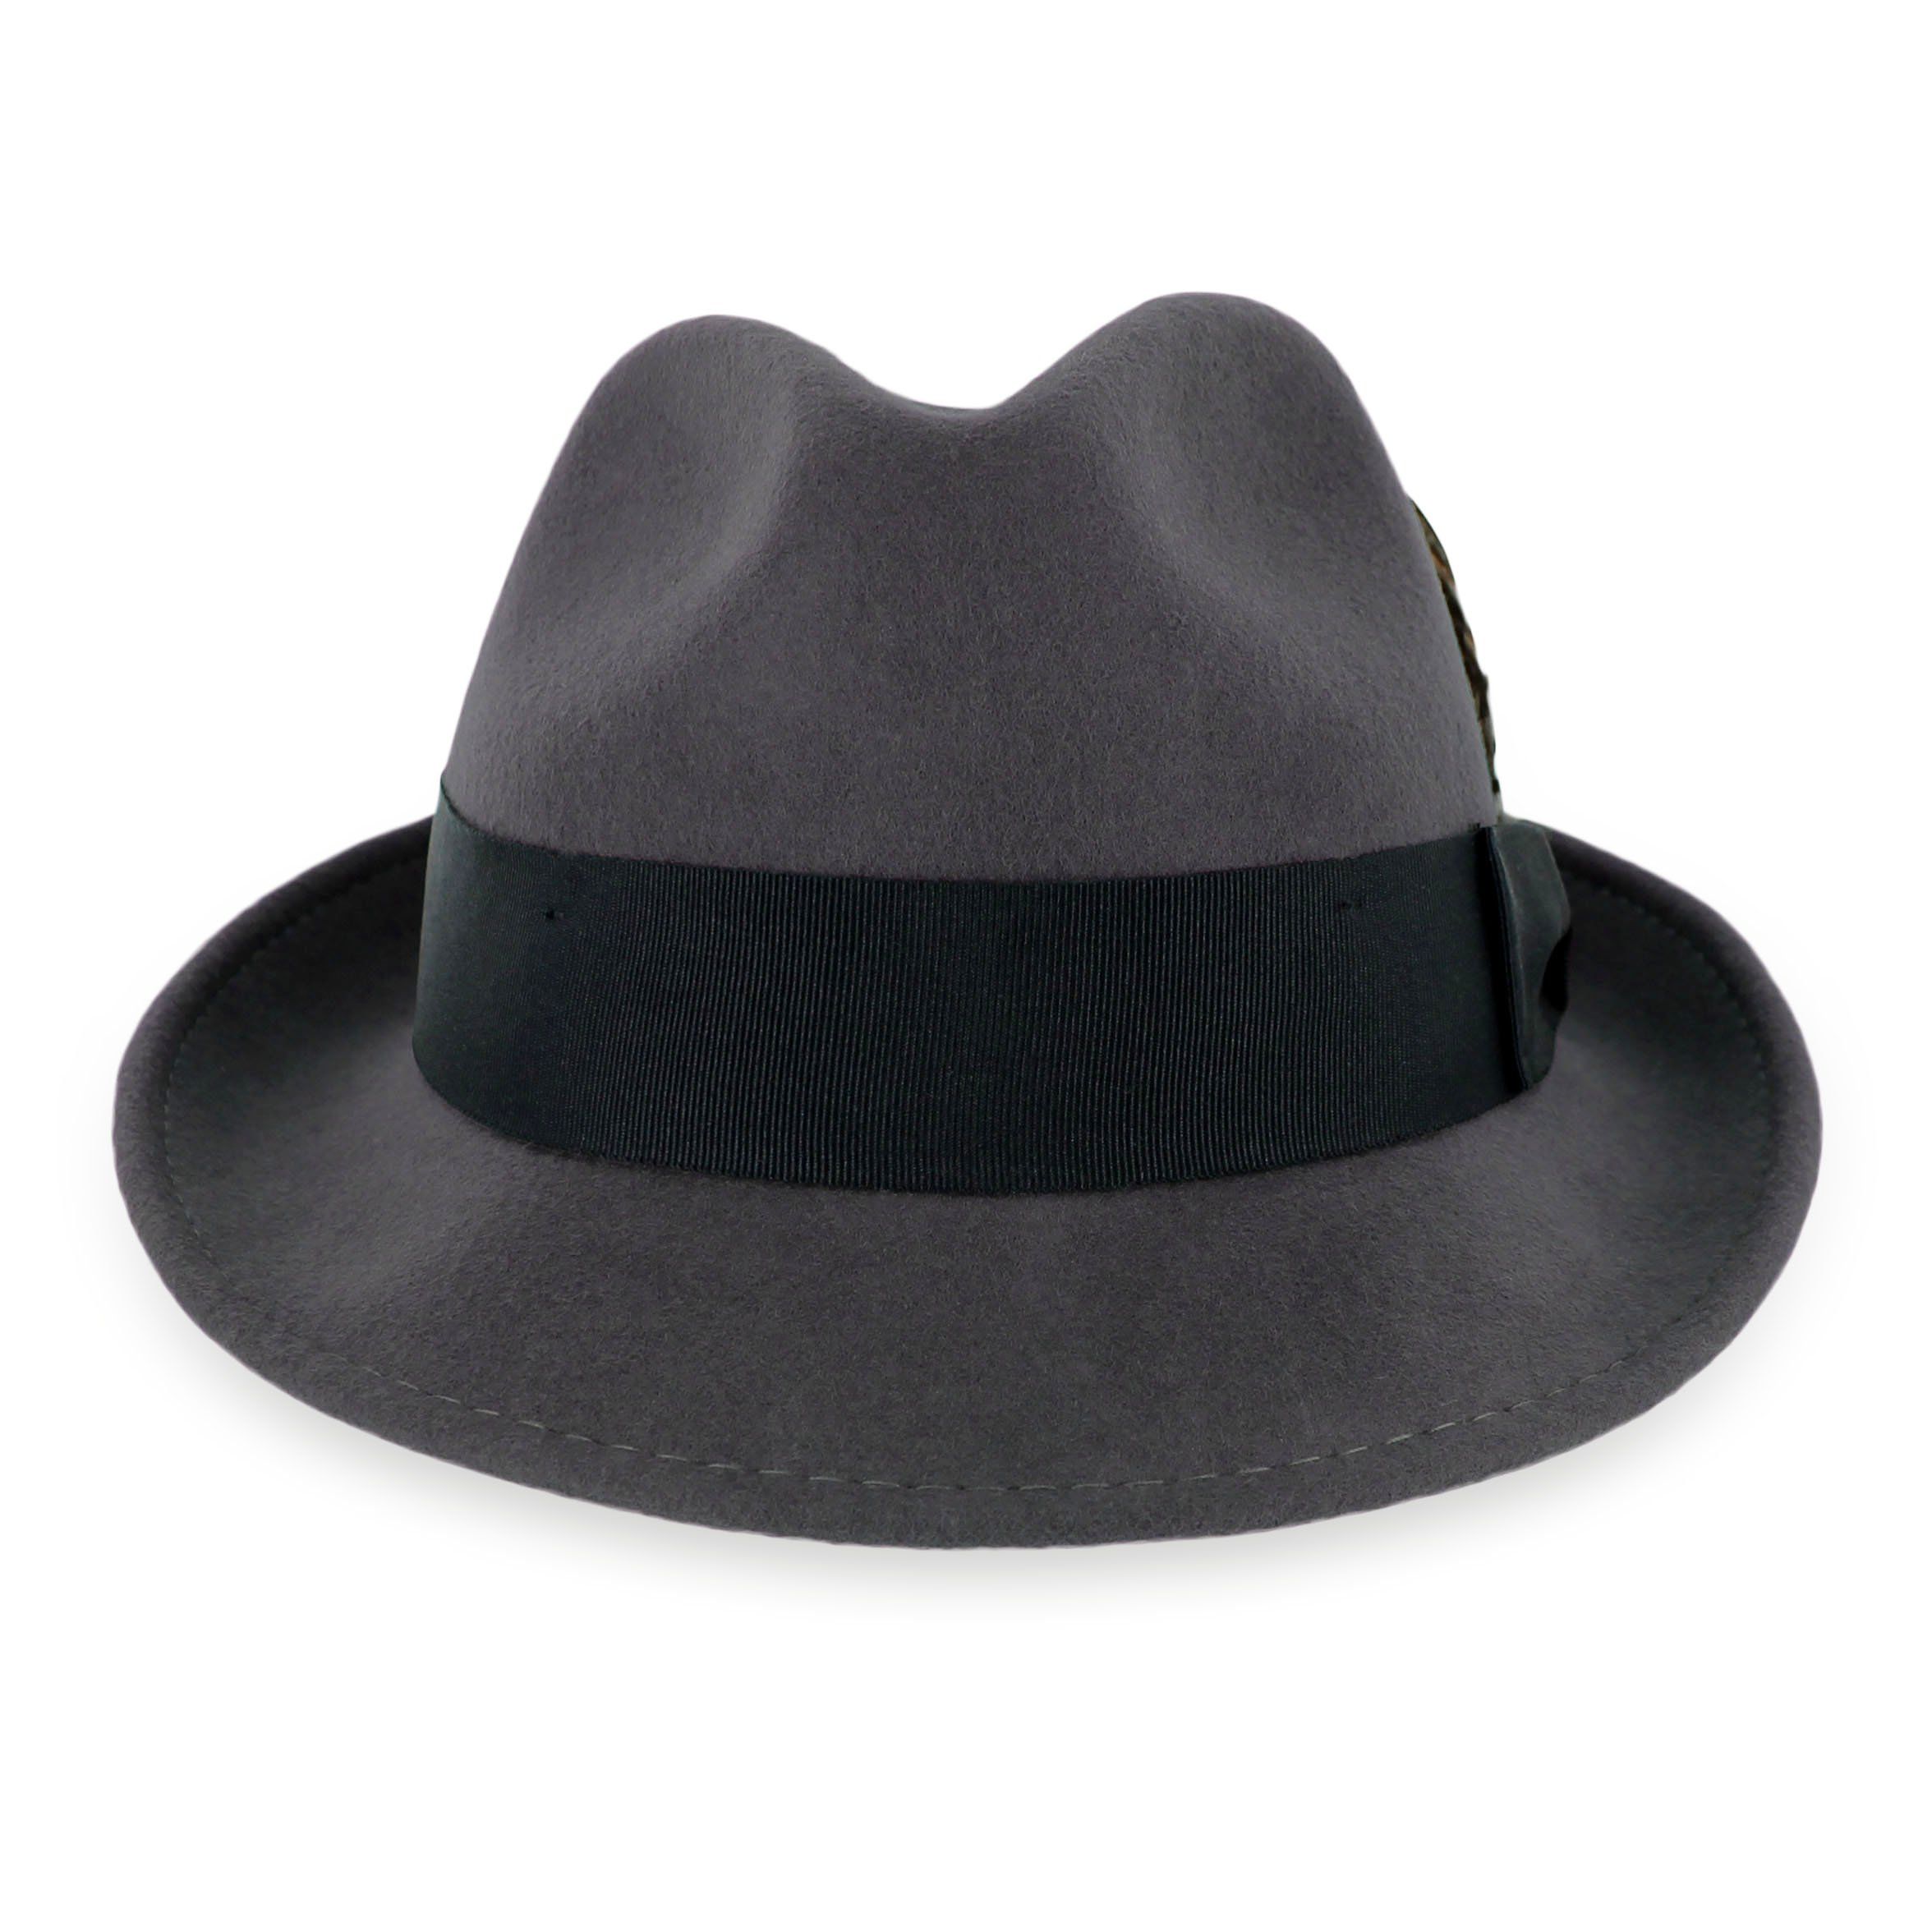 Belfry Trilby Men/Women Snap Brim Vintage Style Dress Fedora Hat 100% Pure Wool Felt Available In Black, Grey, Pecan (S, Grey) by Hats in the Belfry